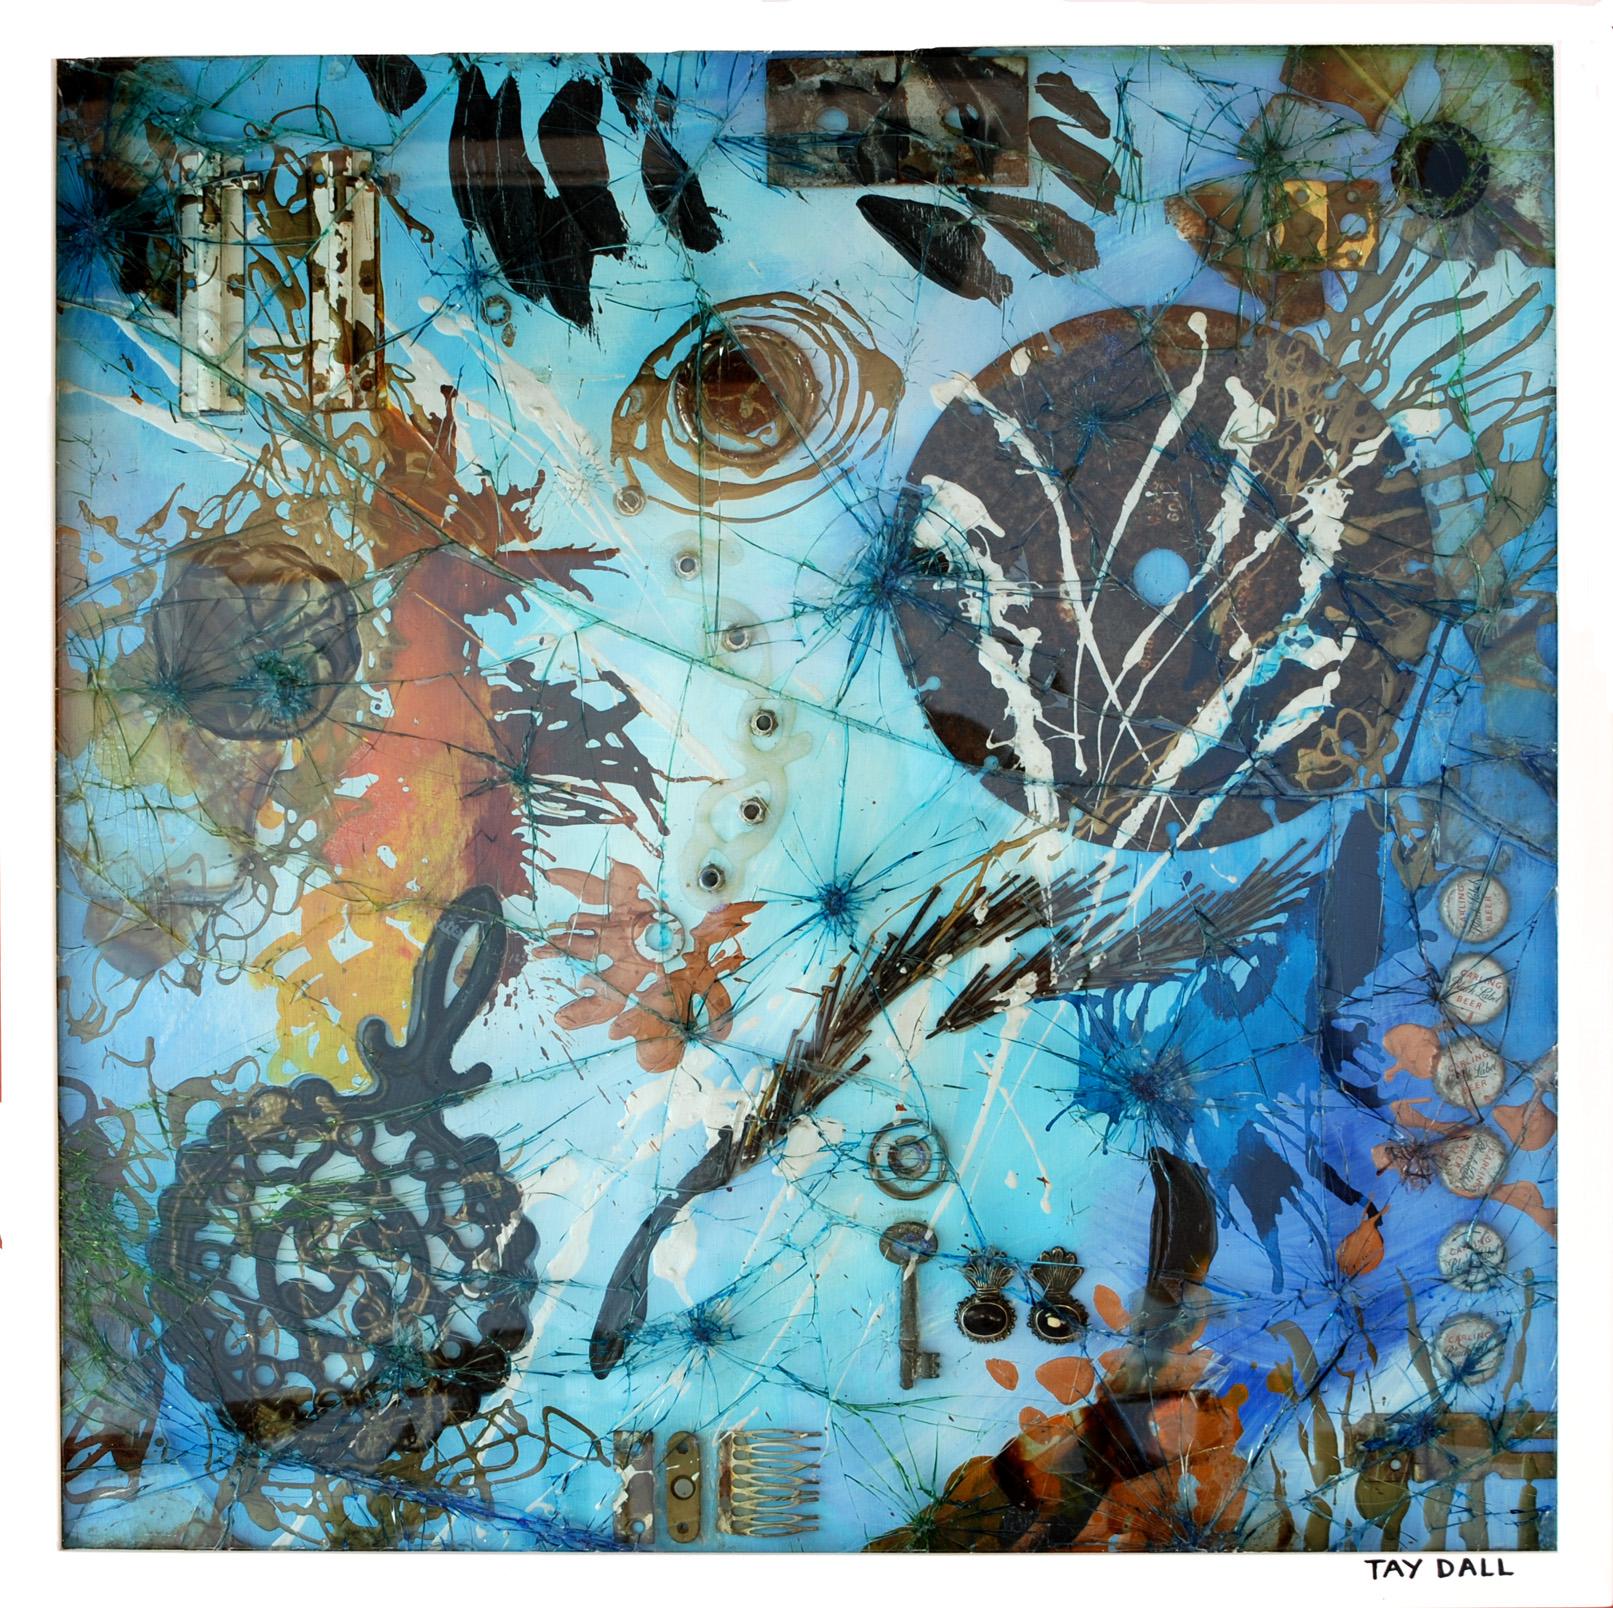 2884 - Smashedglass Assemblage Collage 1 2014.jpg